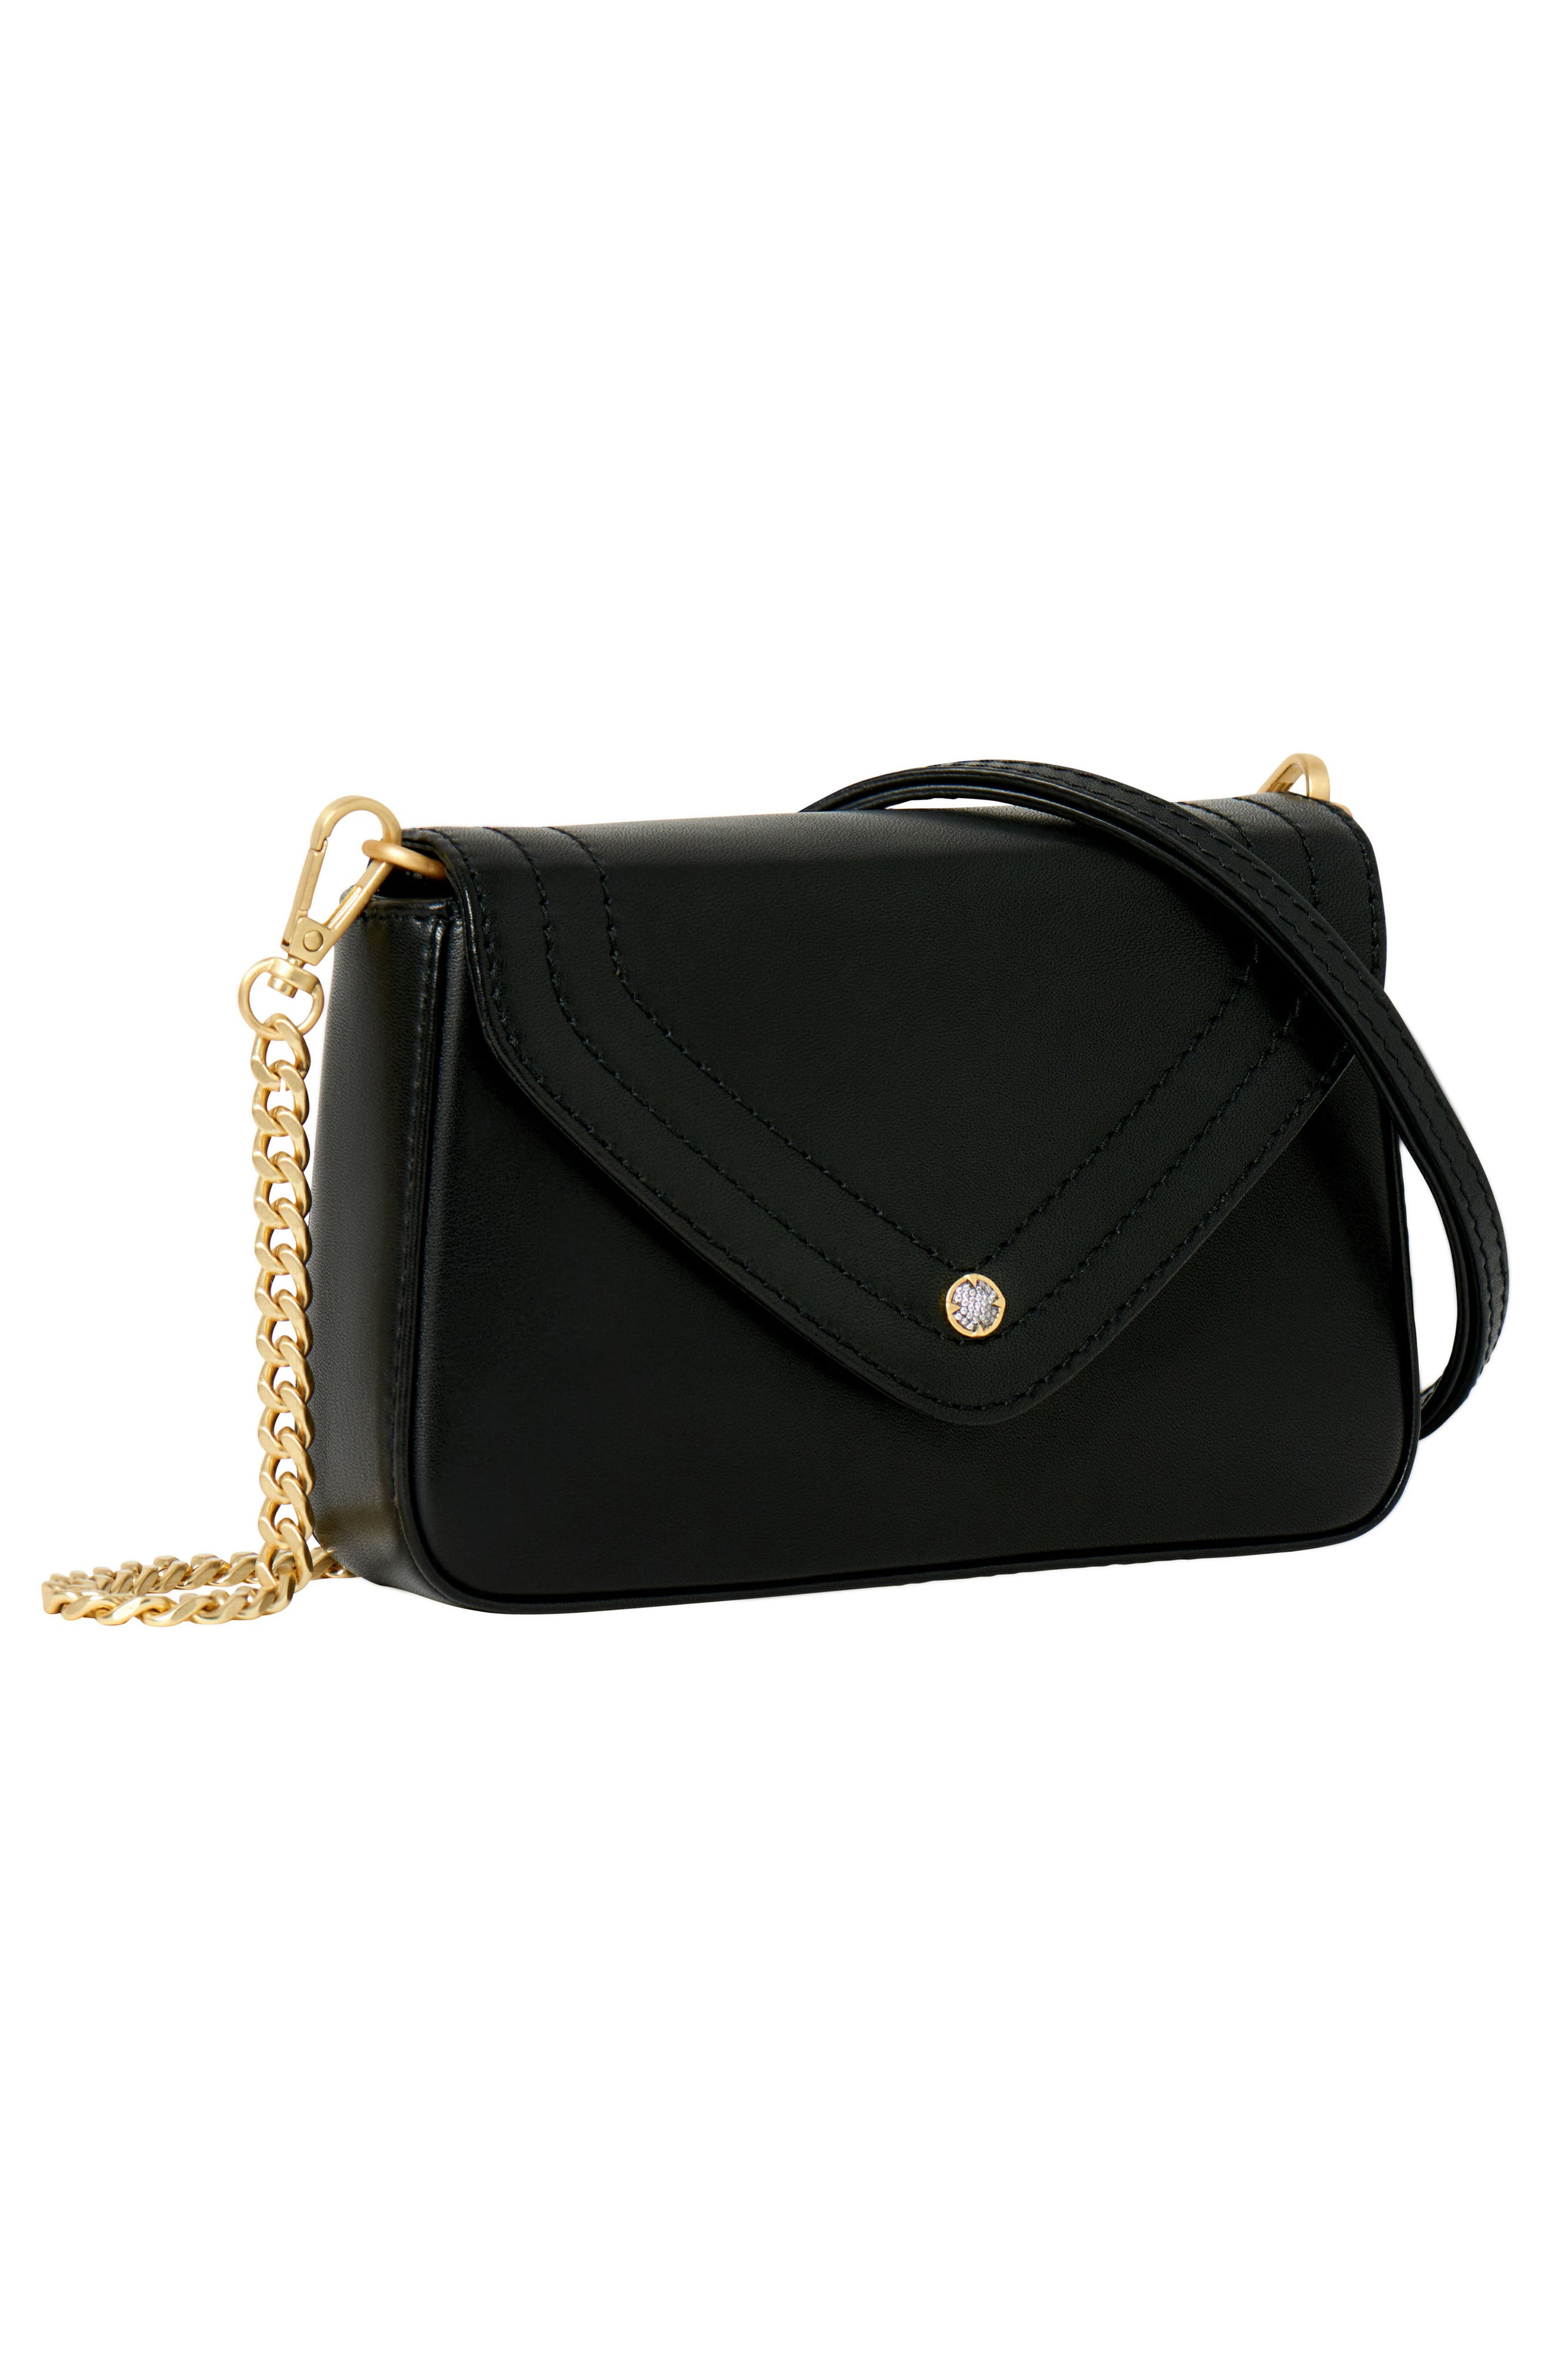 Maiden Leather Crossbody Bag,                             Alternate thumbnail 3, color,                             BLACK